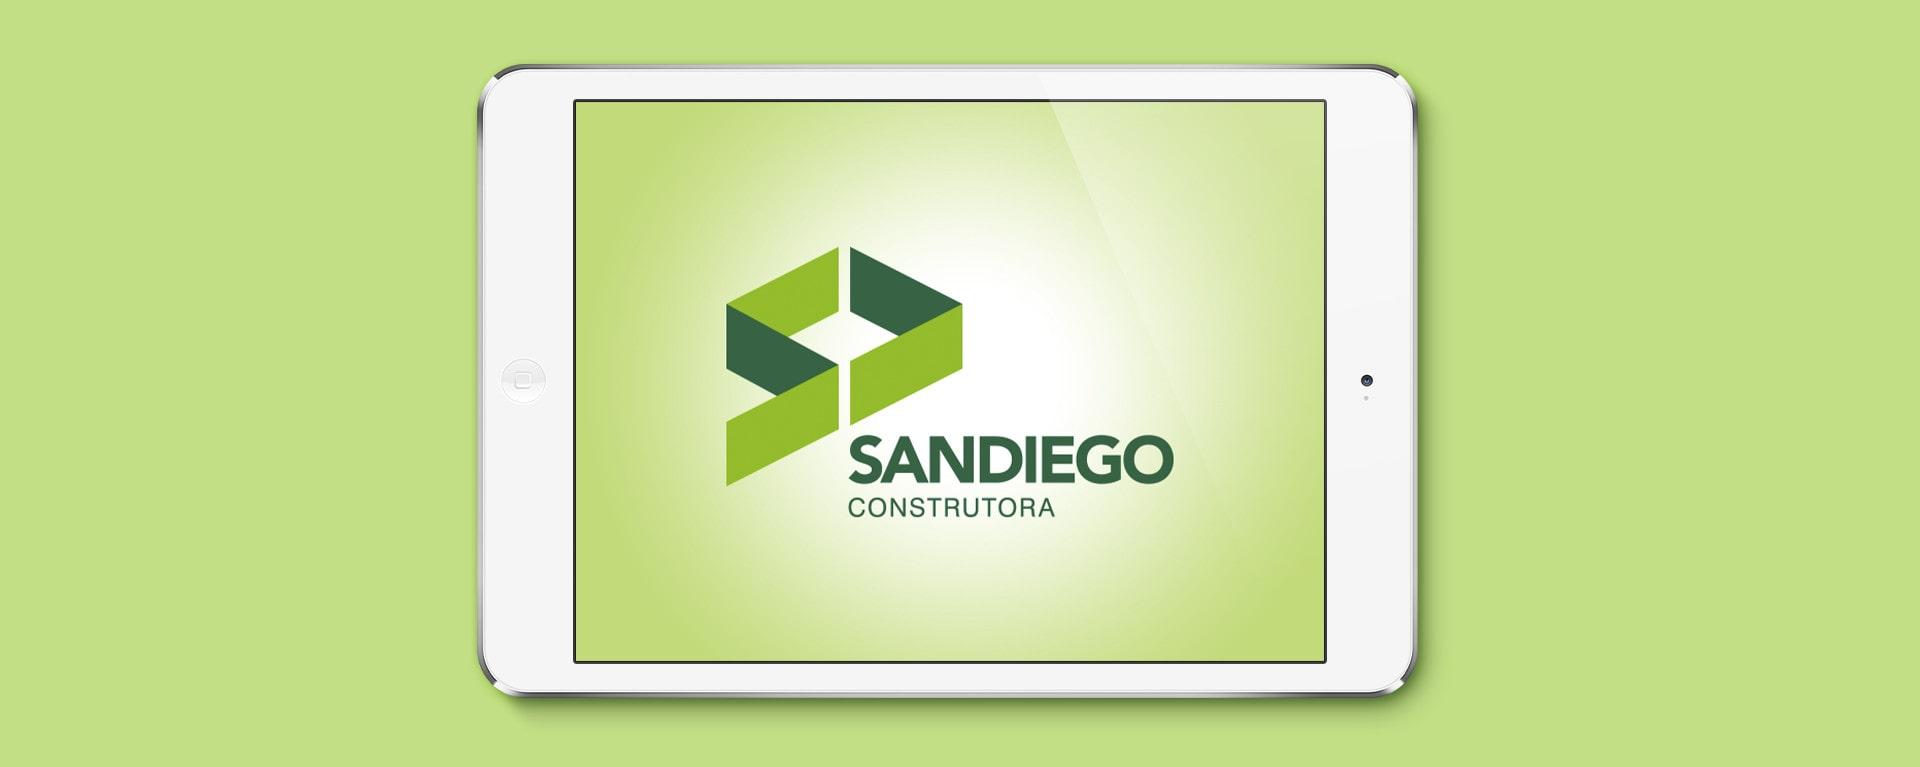 Logotipo SanDiego